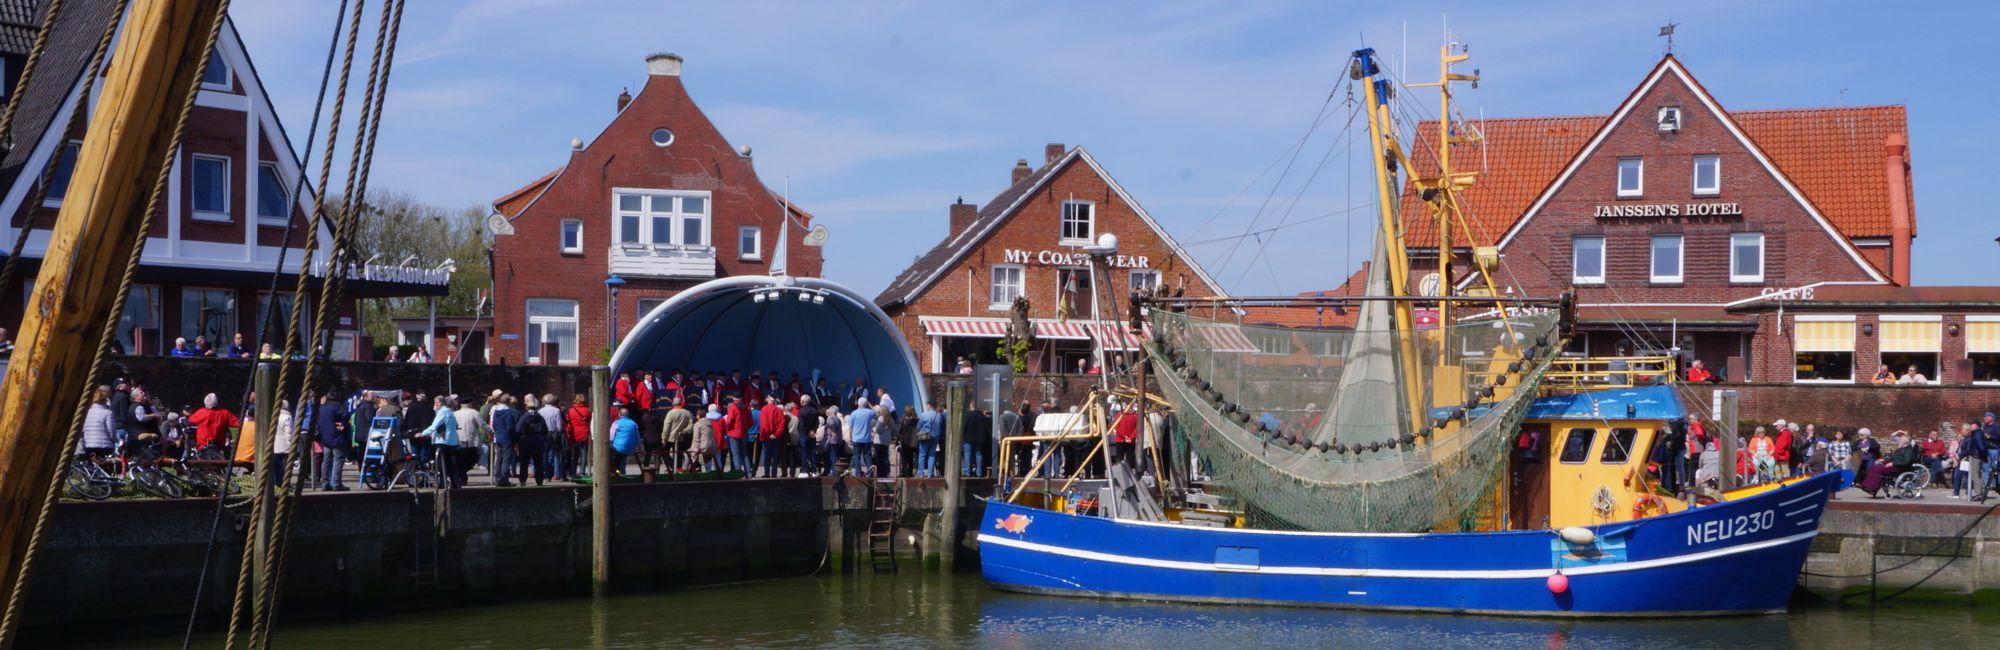 Shanty-Chor im Hafen Neuharlingersiel